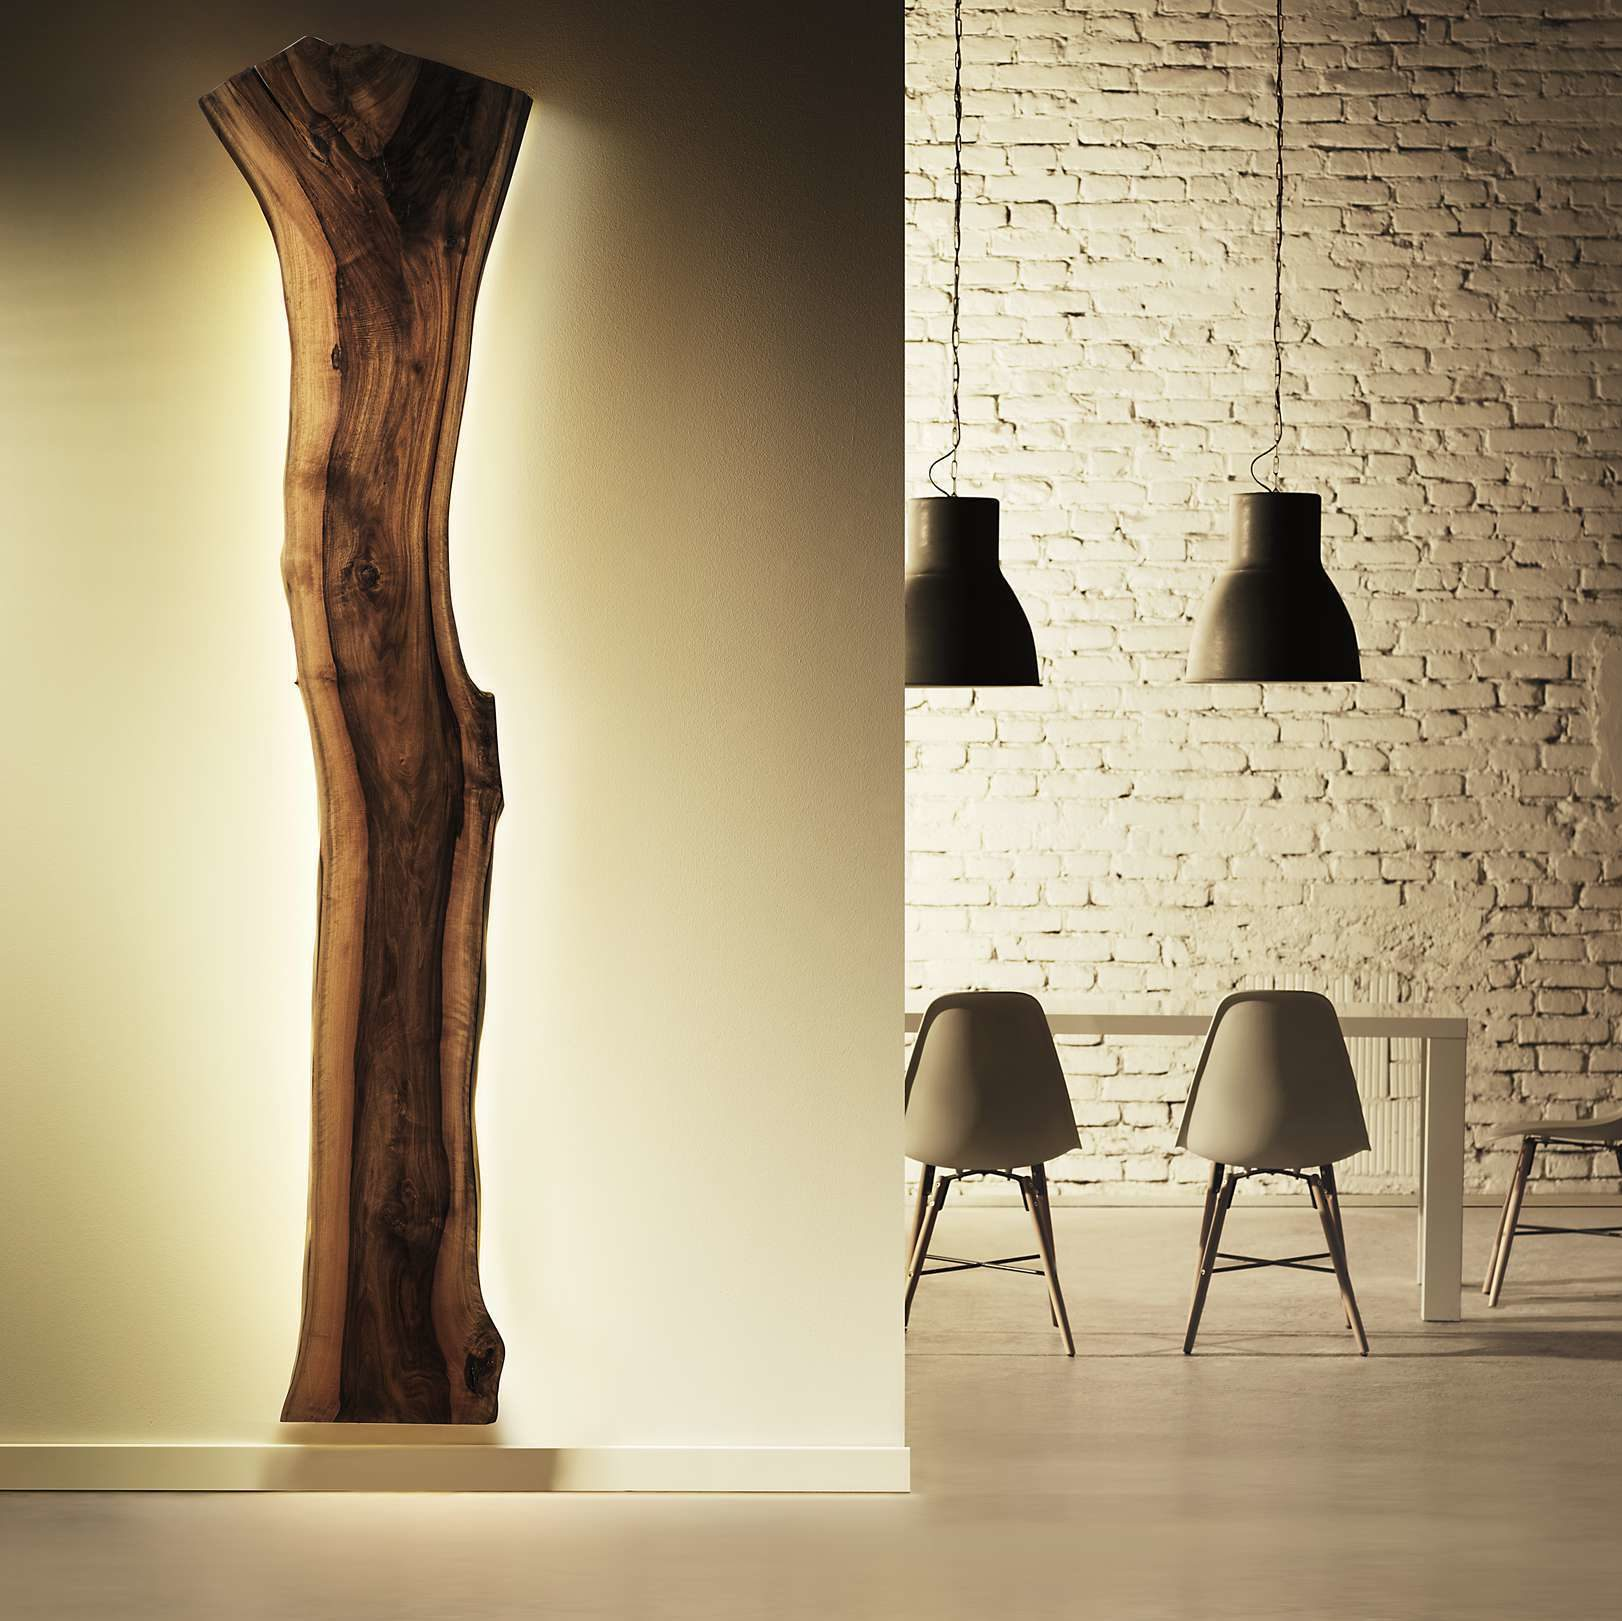 Charaktervolles Wandbild aus Nuss Massivholz mit intigirerter LED-Belauchtung. Kunstobjekt im Wohnzimmer.